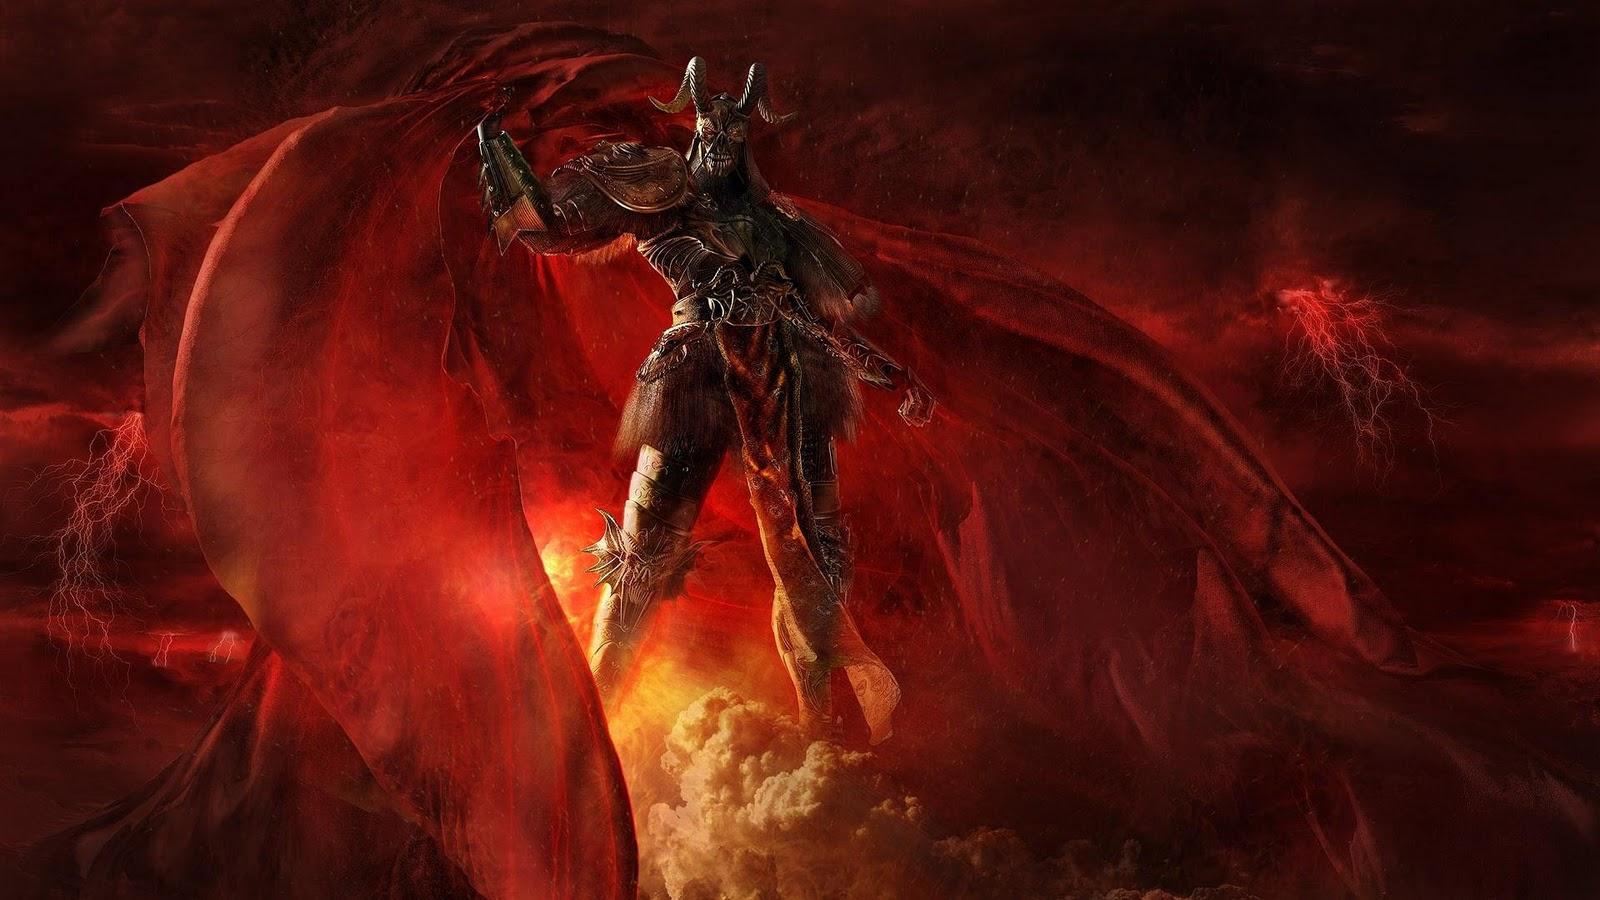 devil wallpapers devil wallpapers devil wallpapers devil wallpapers 1600x900